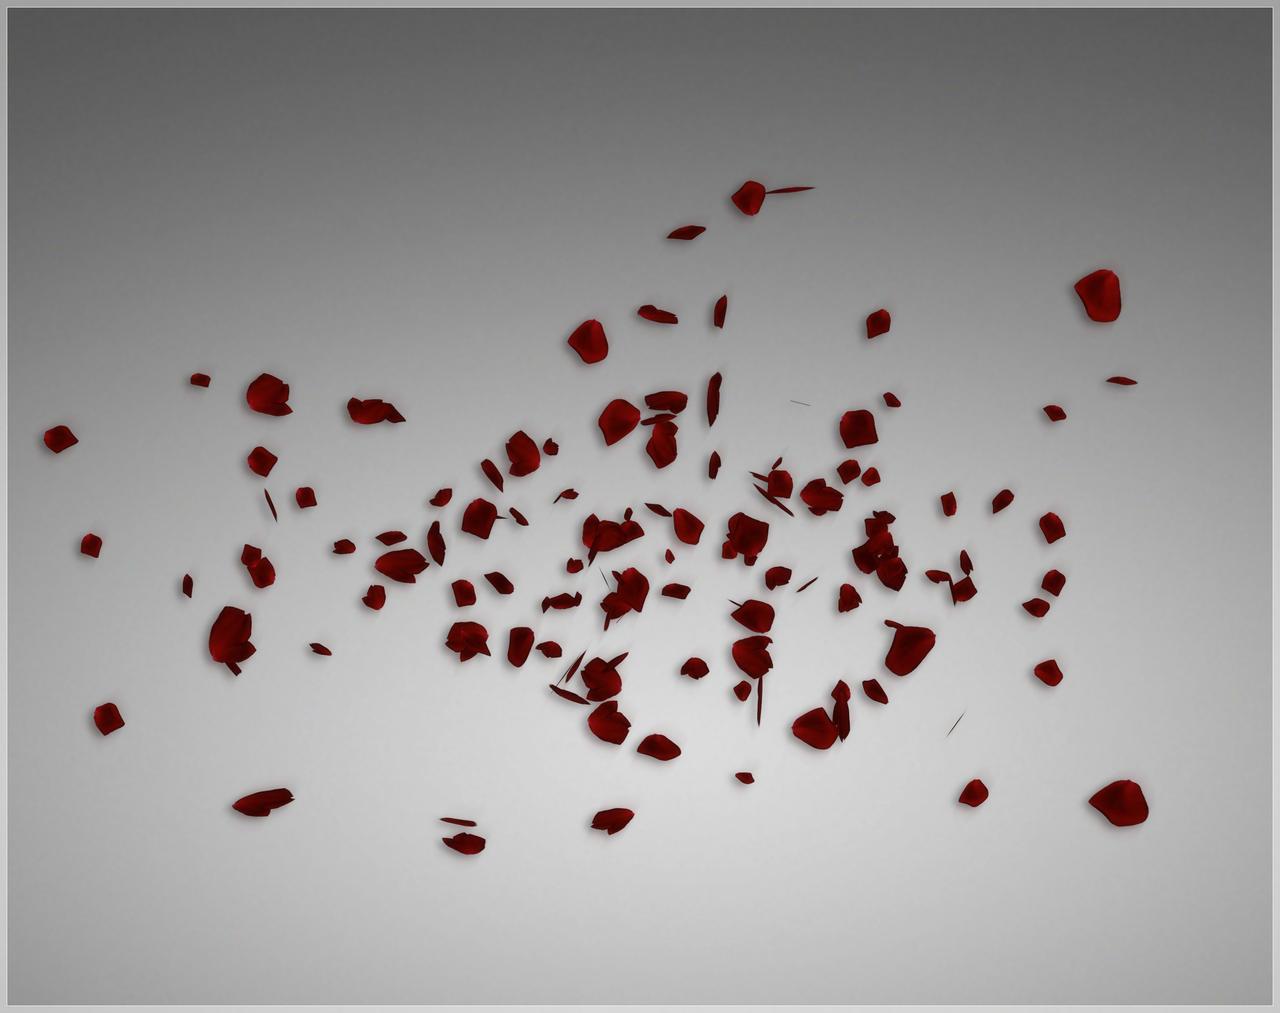 Falling Rose Petals by deexie on DeviantArt Petals Falling From A Flower